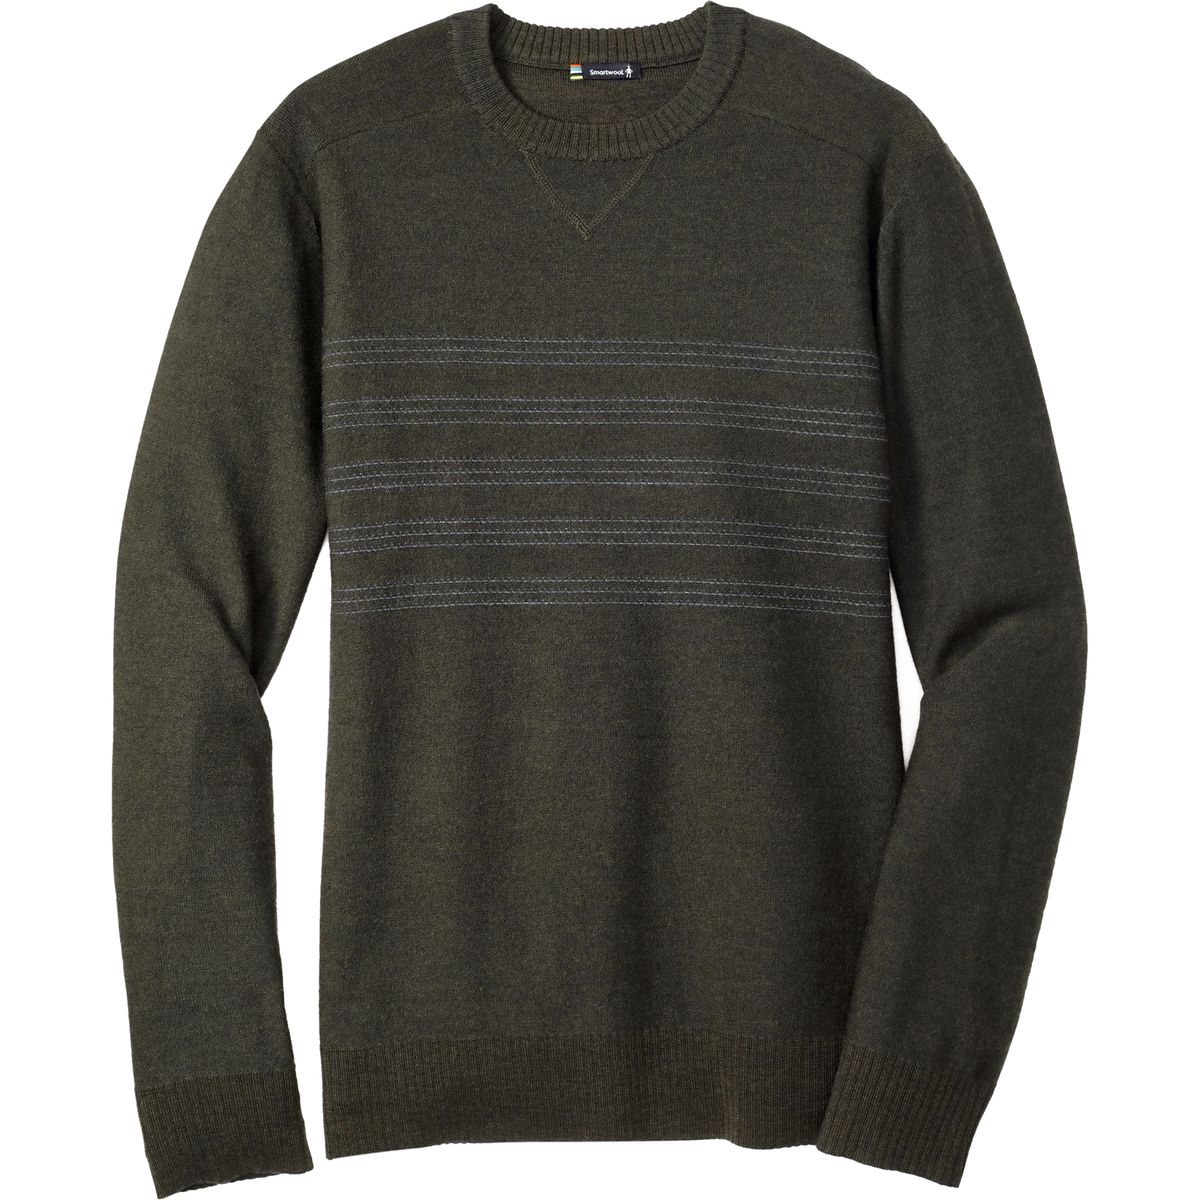 Smartwool Kiva Ridge Reverse Jersey Stripe Crew Sweater - Olive Heather